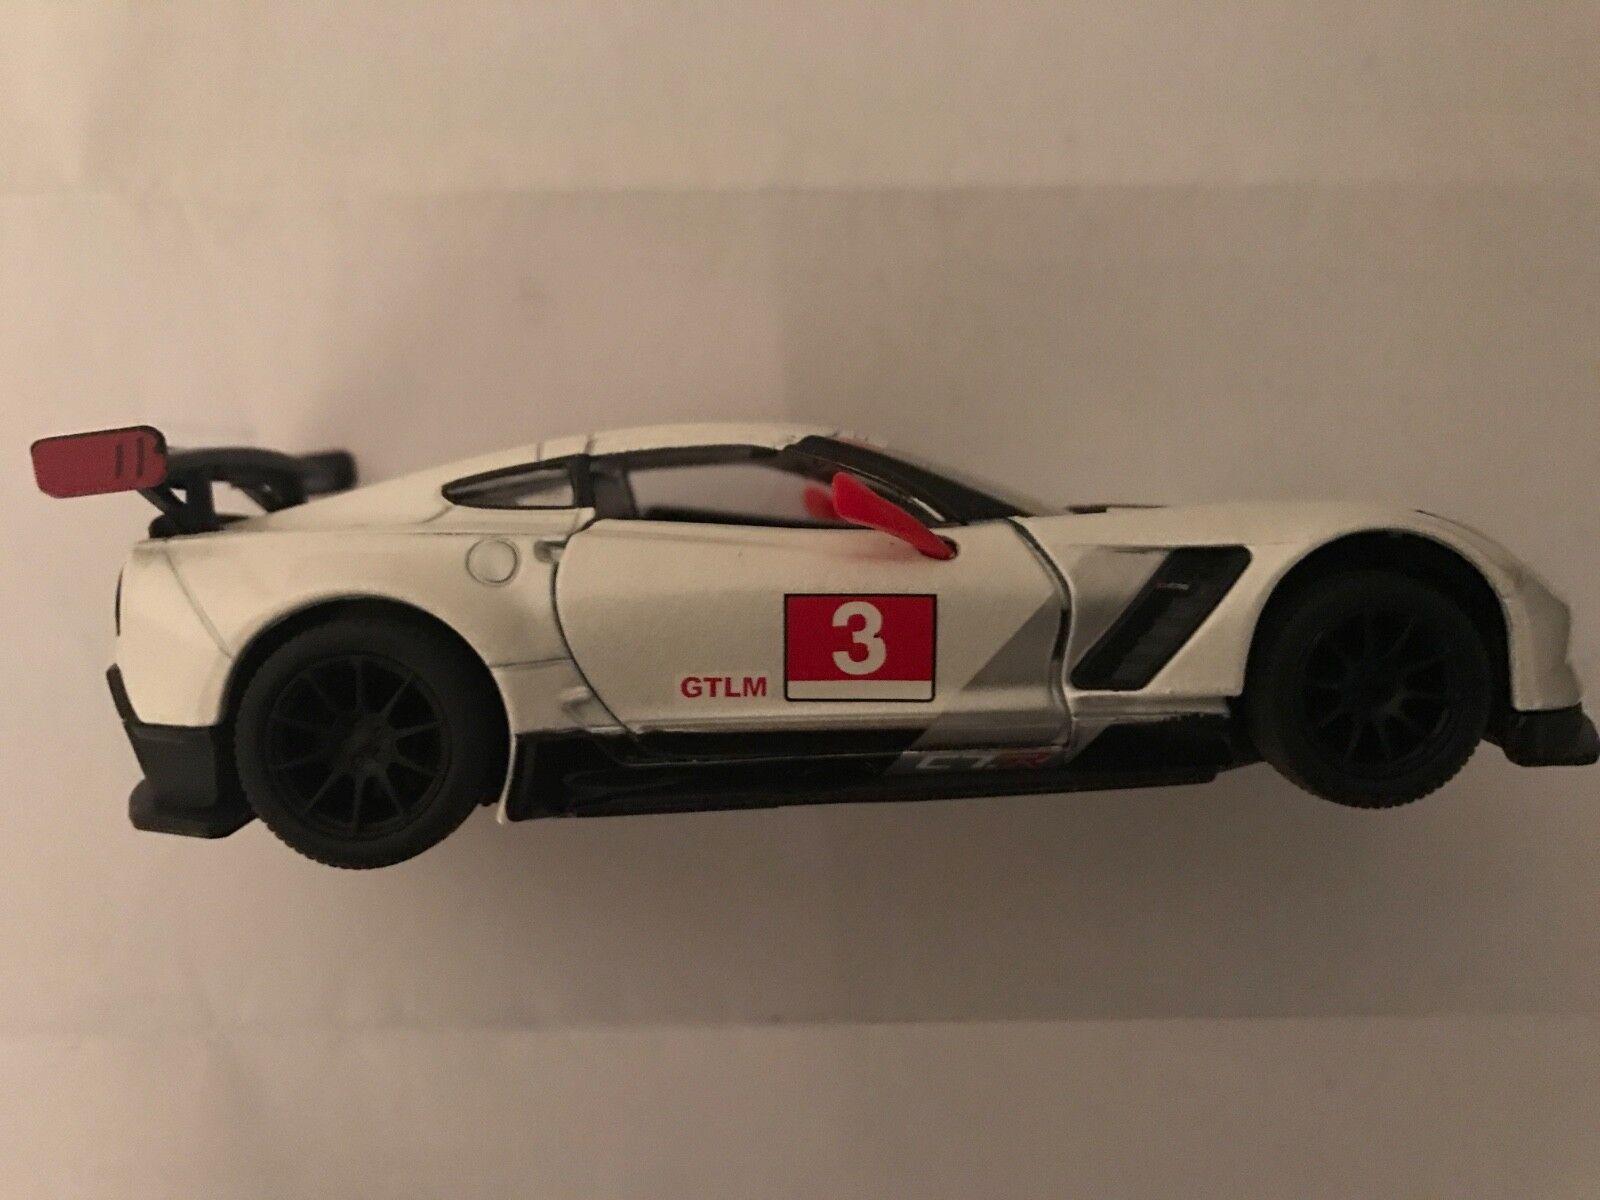 TOY    Diecast Car White Corvette 2018 Free Shipping a65ae5